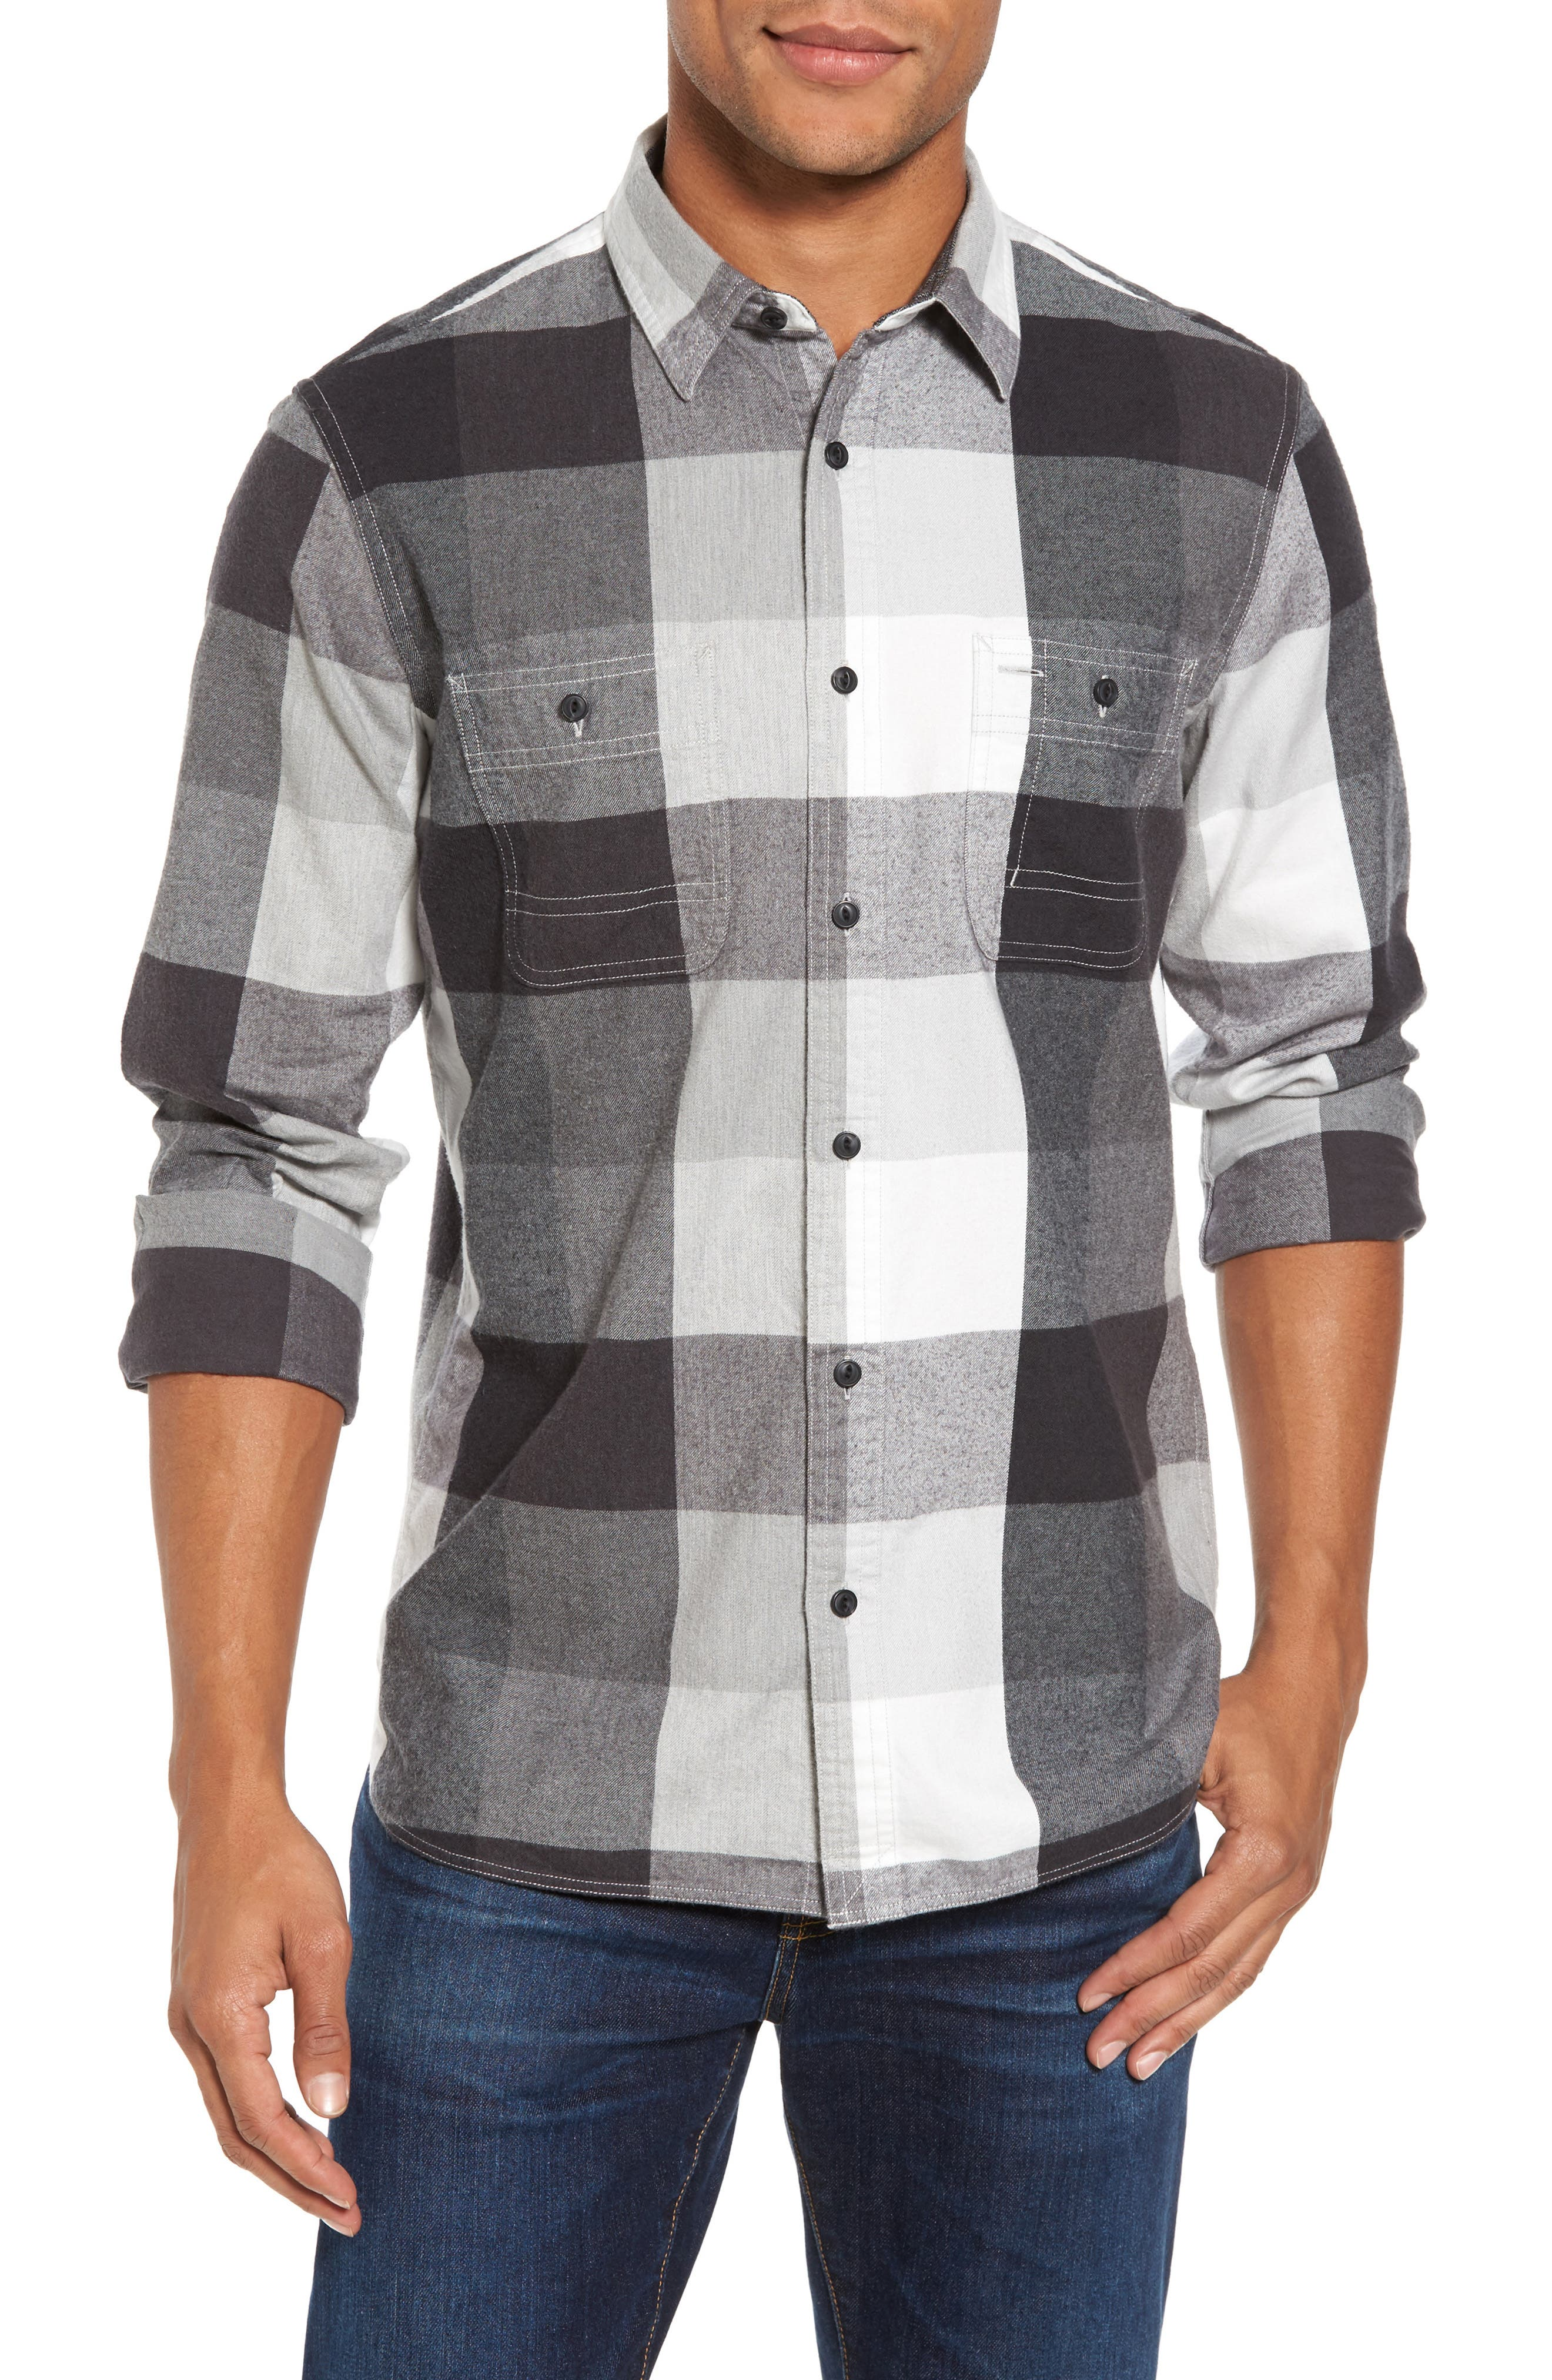 Trim Fit Workwear Check Flannel Shirt,                         Main,                         color, Grey Paloma Buffalo Plaid